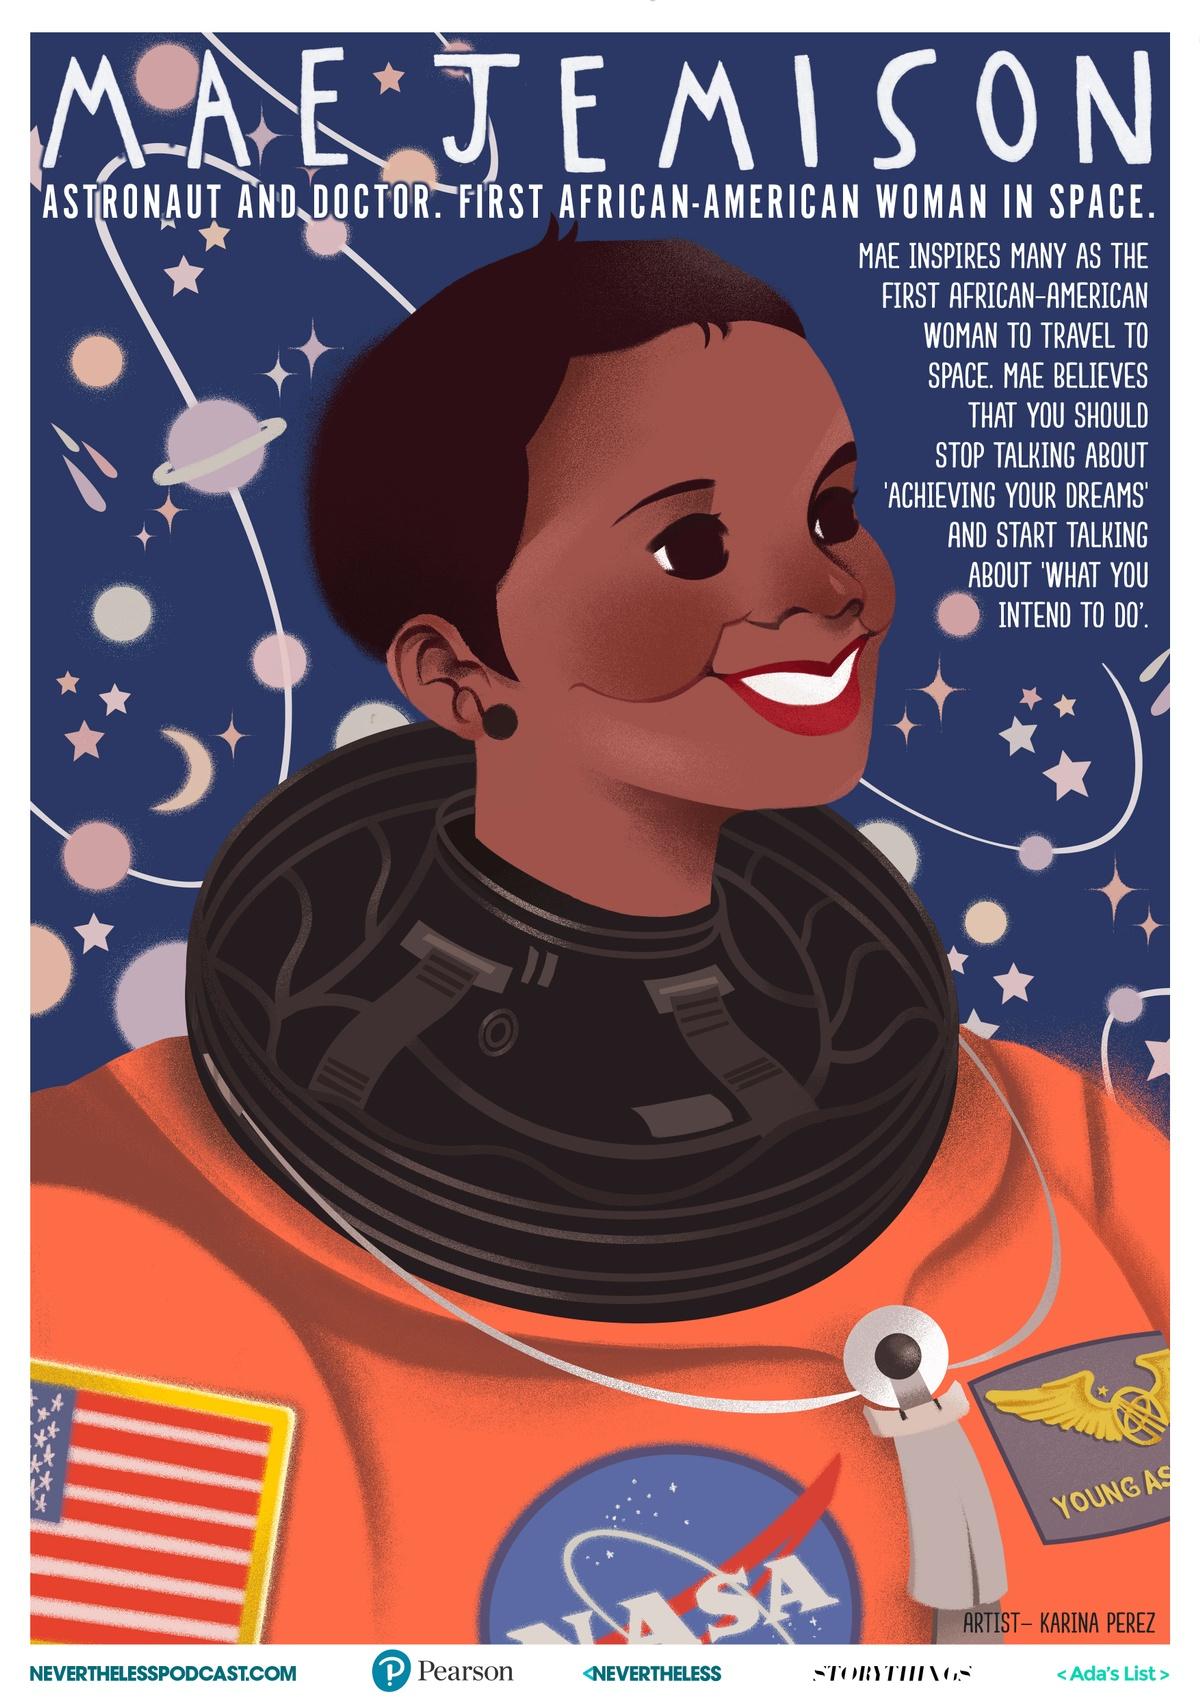 illustrated poster of Mae Jemison by Karina Perez